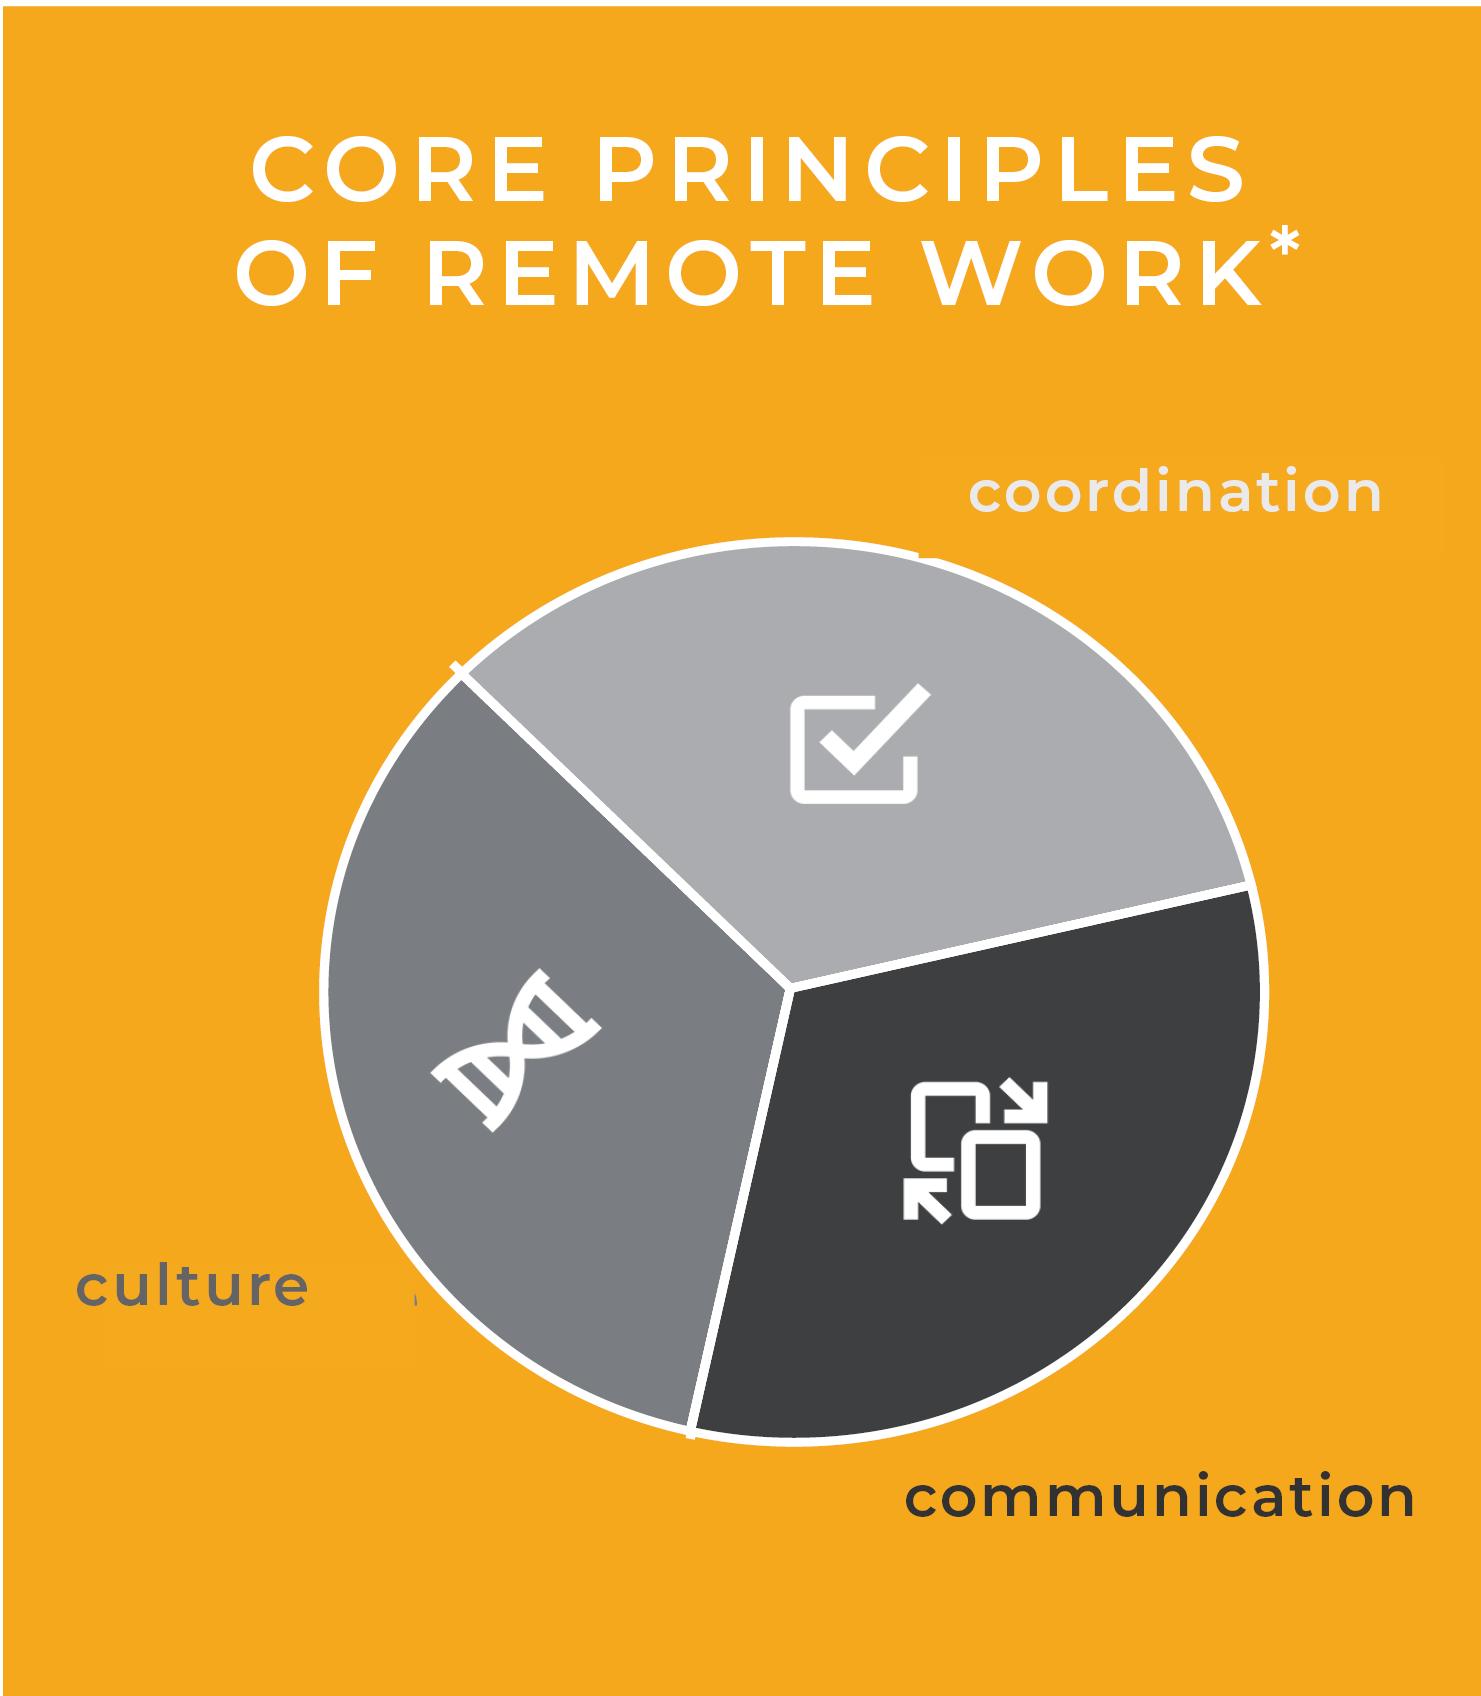 core principles of remote work